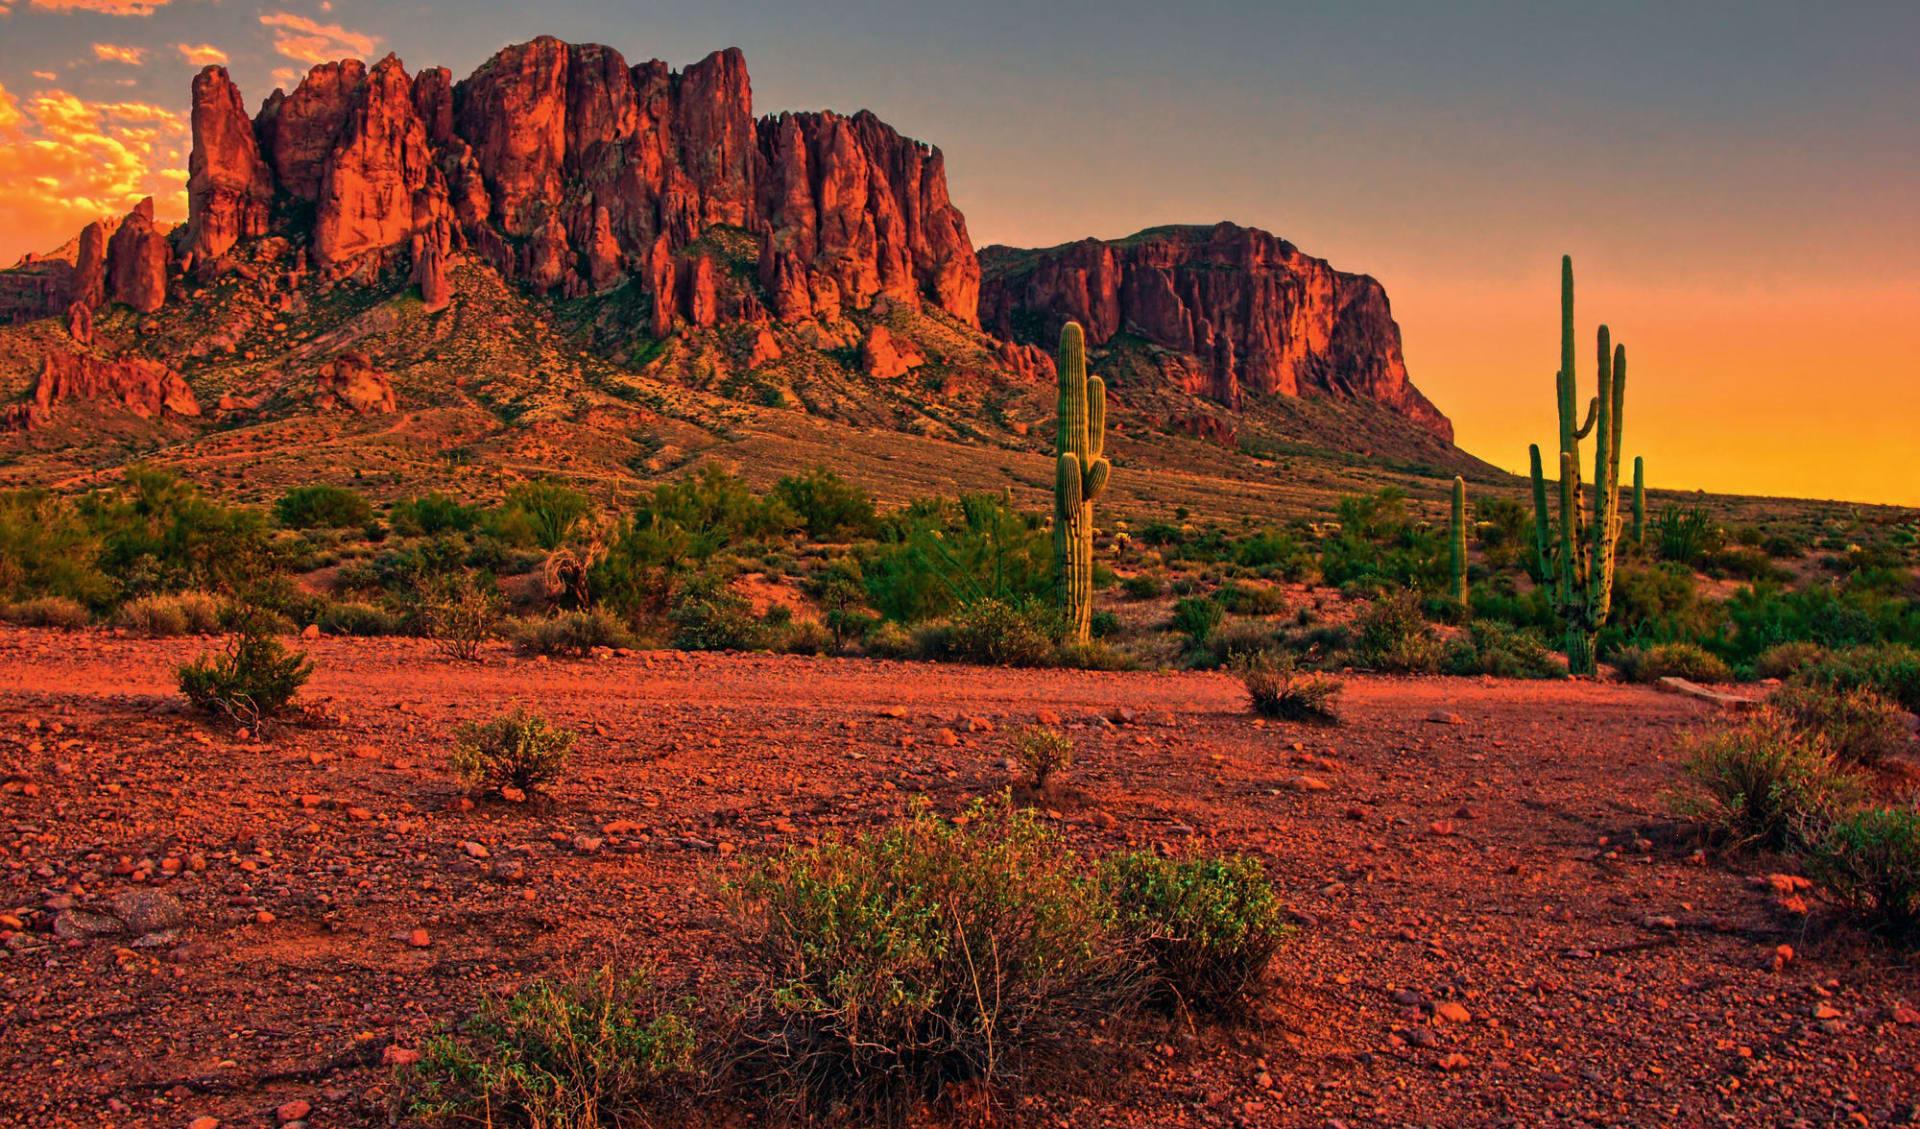 Spirit of the Southwest ab Phoenix: USA - Arizona - Desert Sunset near Phoenix